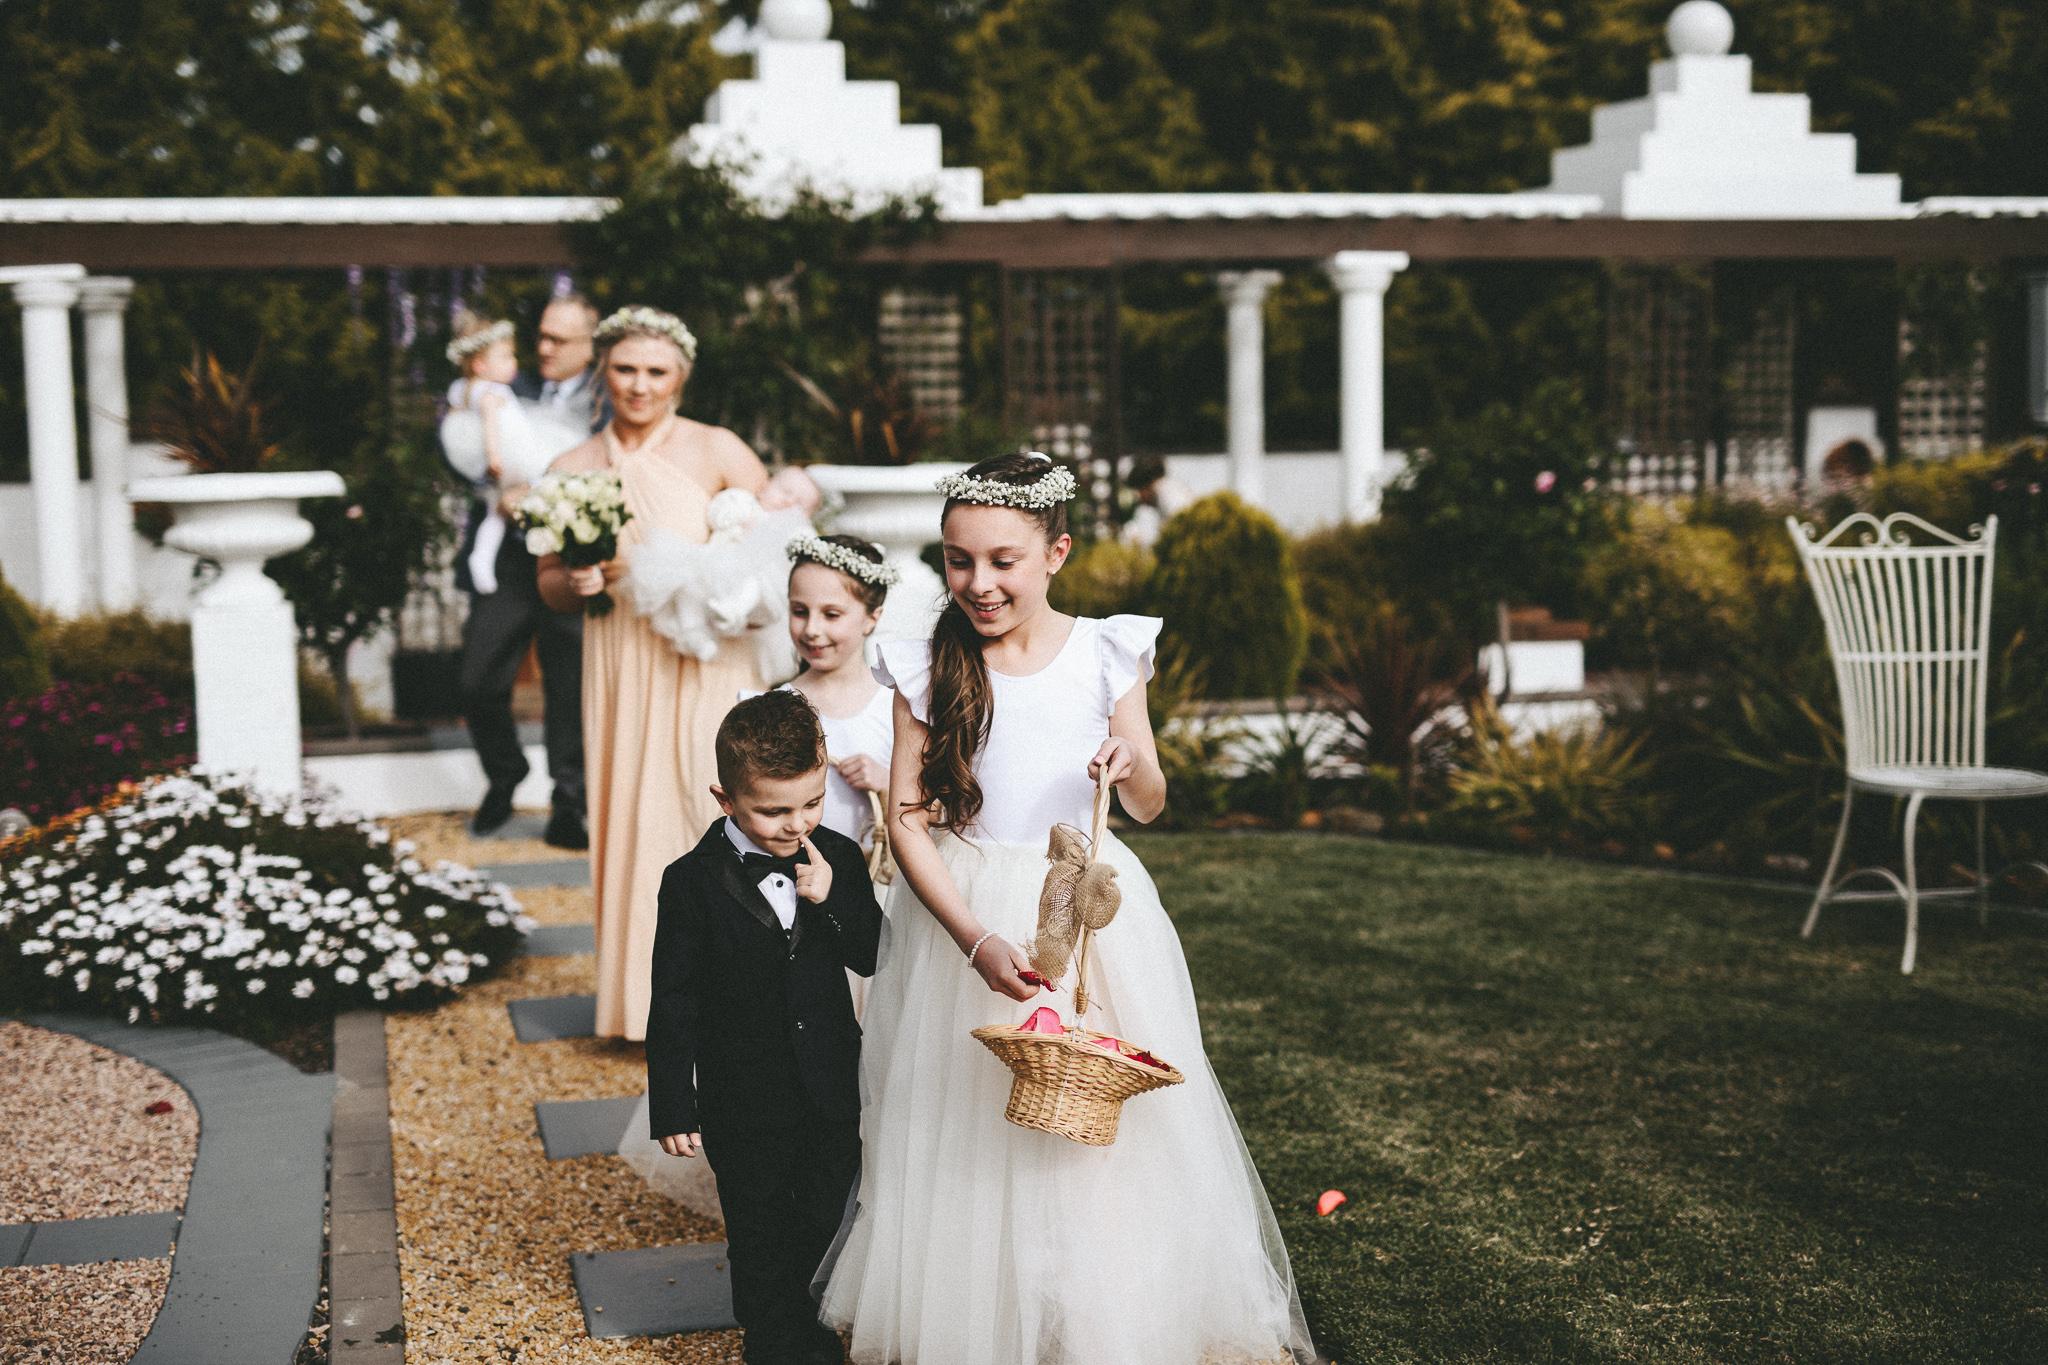 christopher morrison_adelaide hills wedding_ andy + teegan_40_0501.jpg